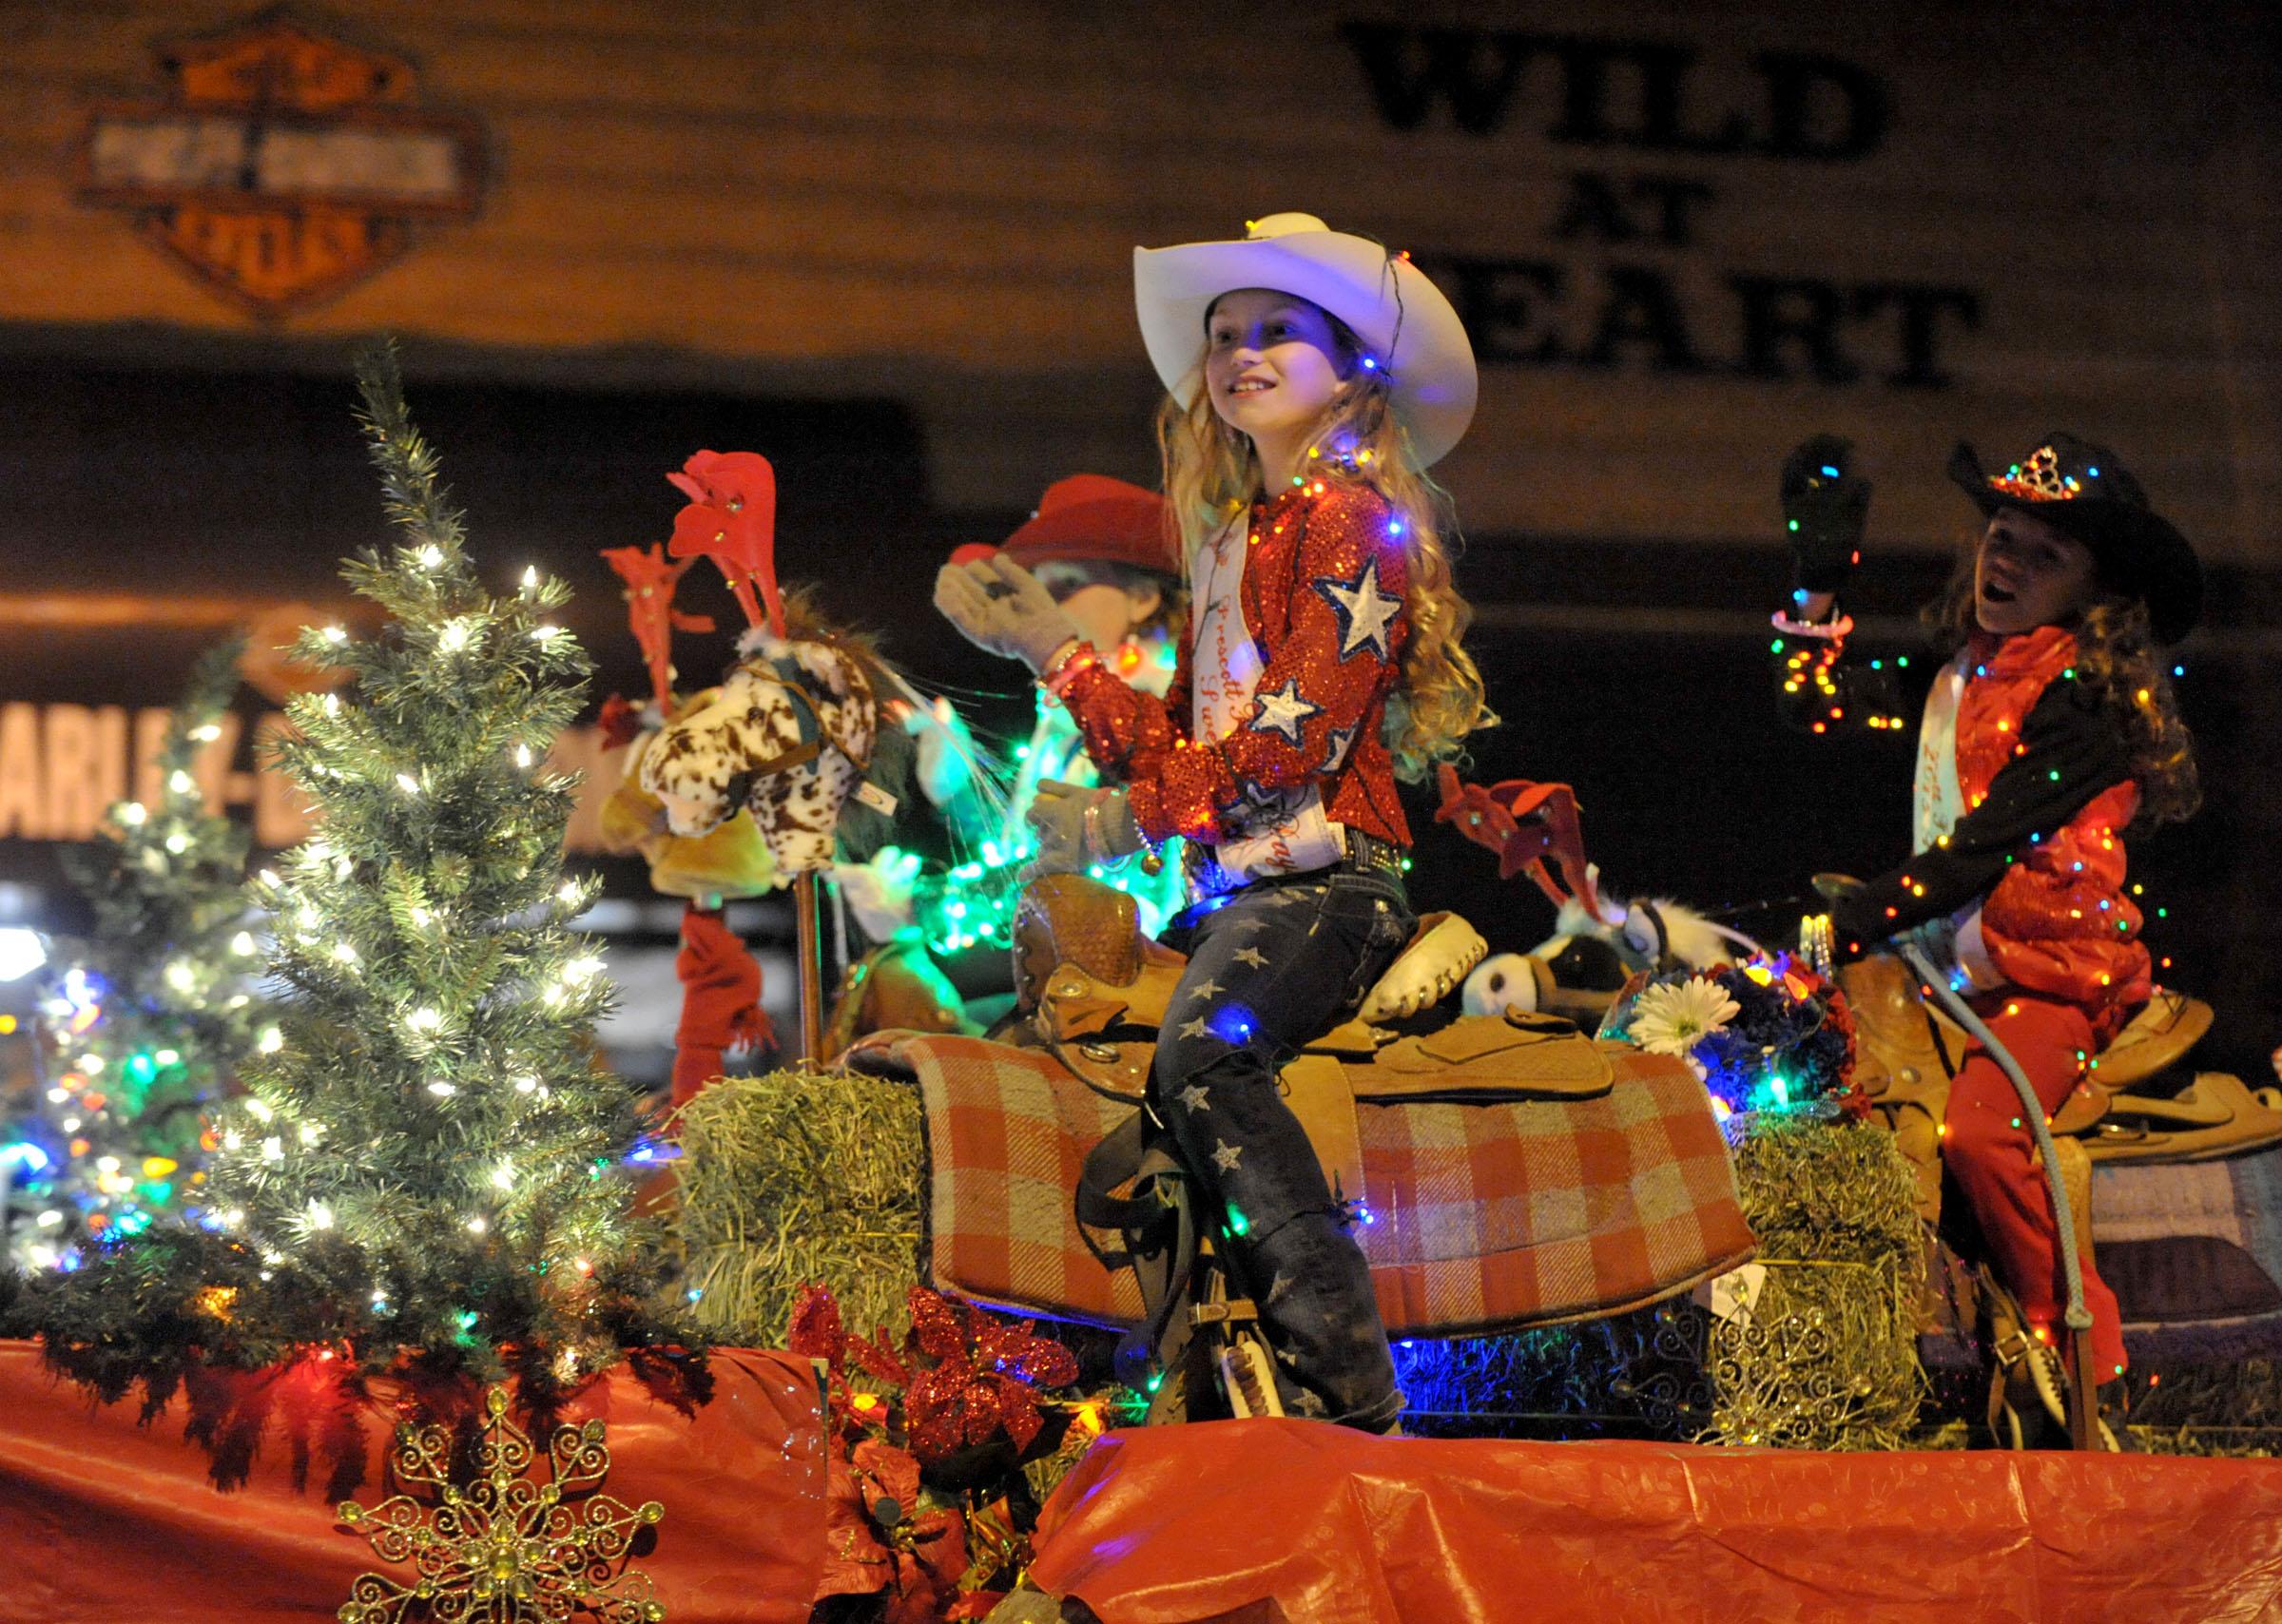 Light parade kicks off holiday season | The Daily Courier | Prescott, AZ